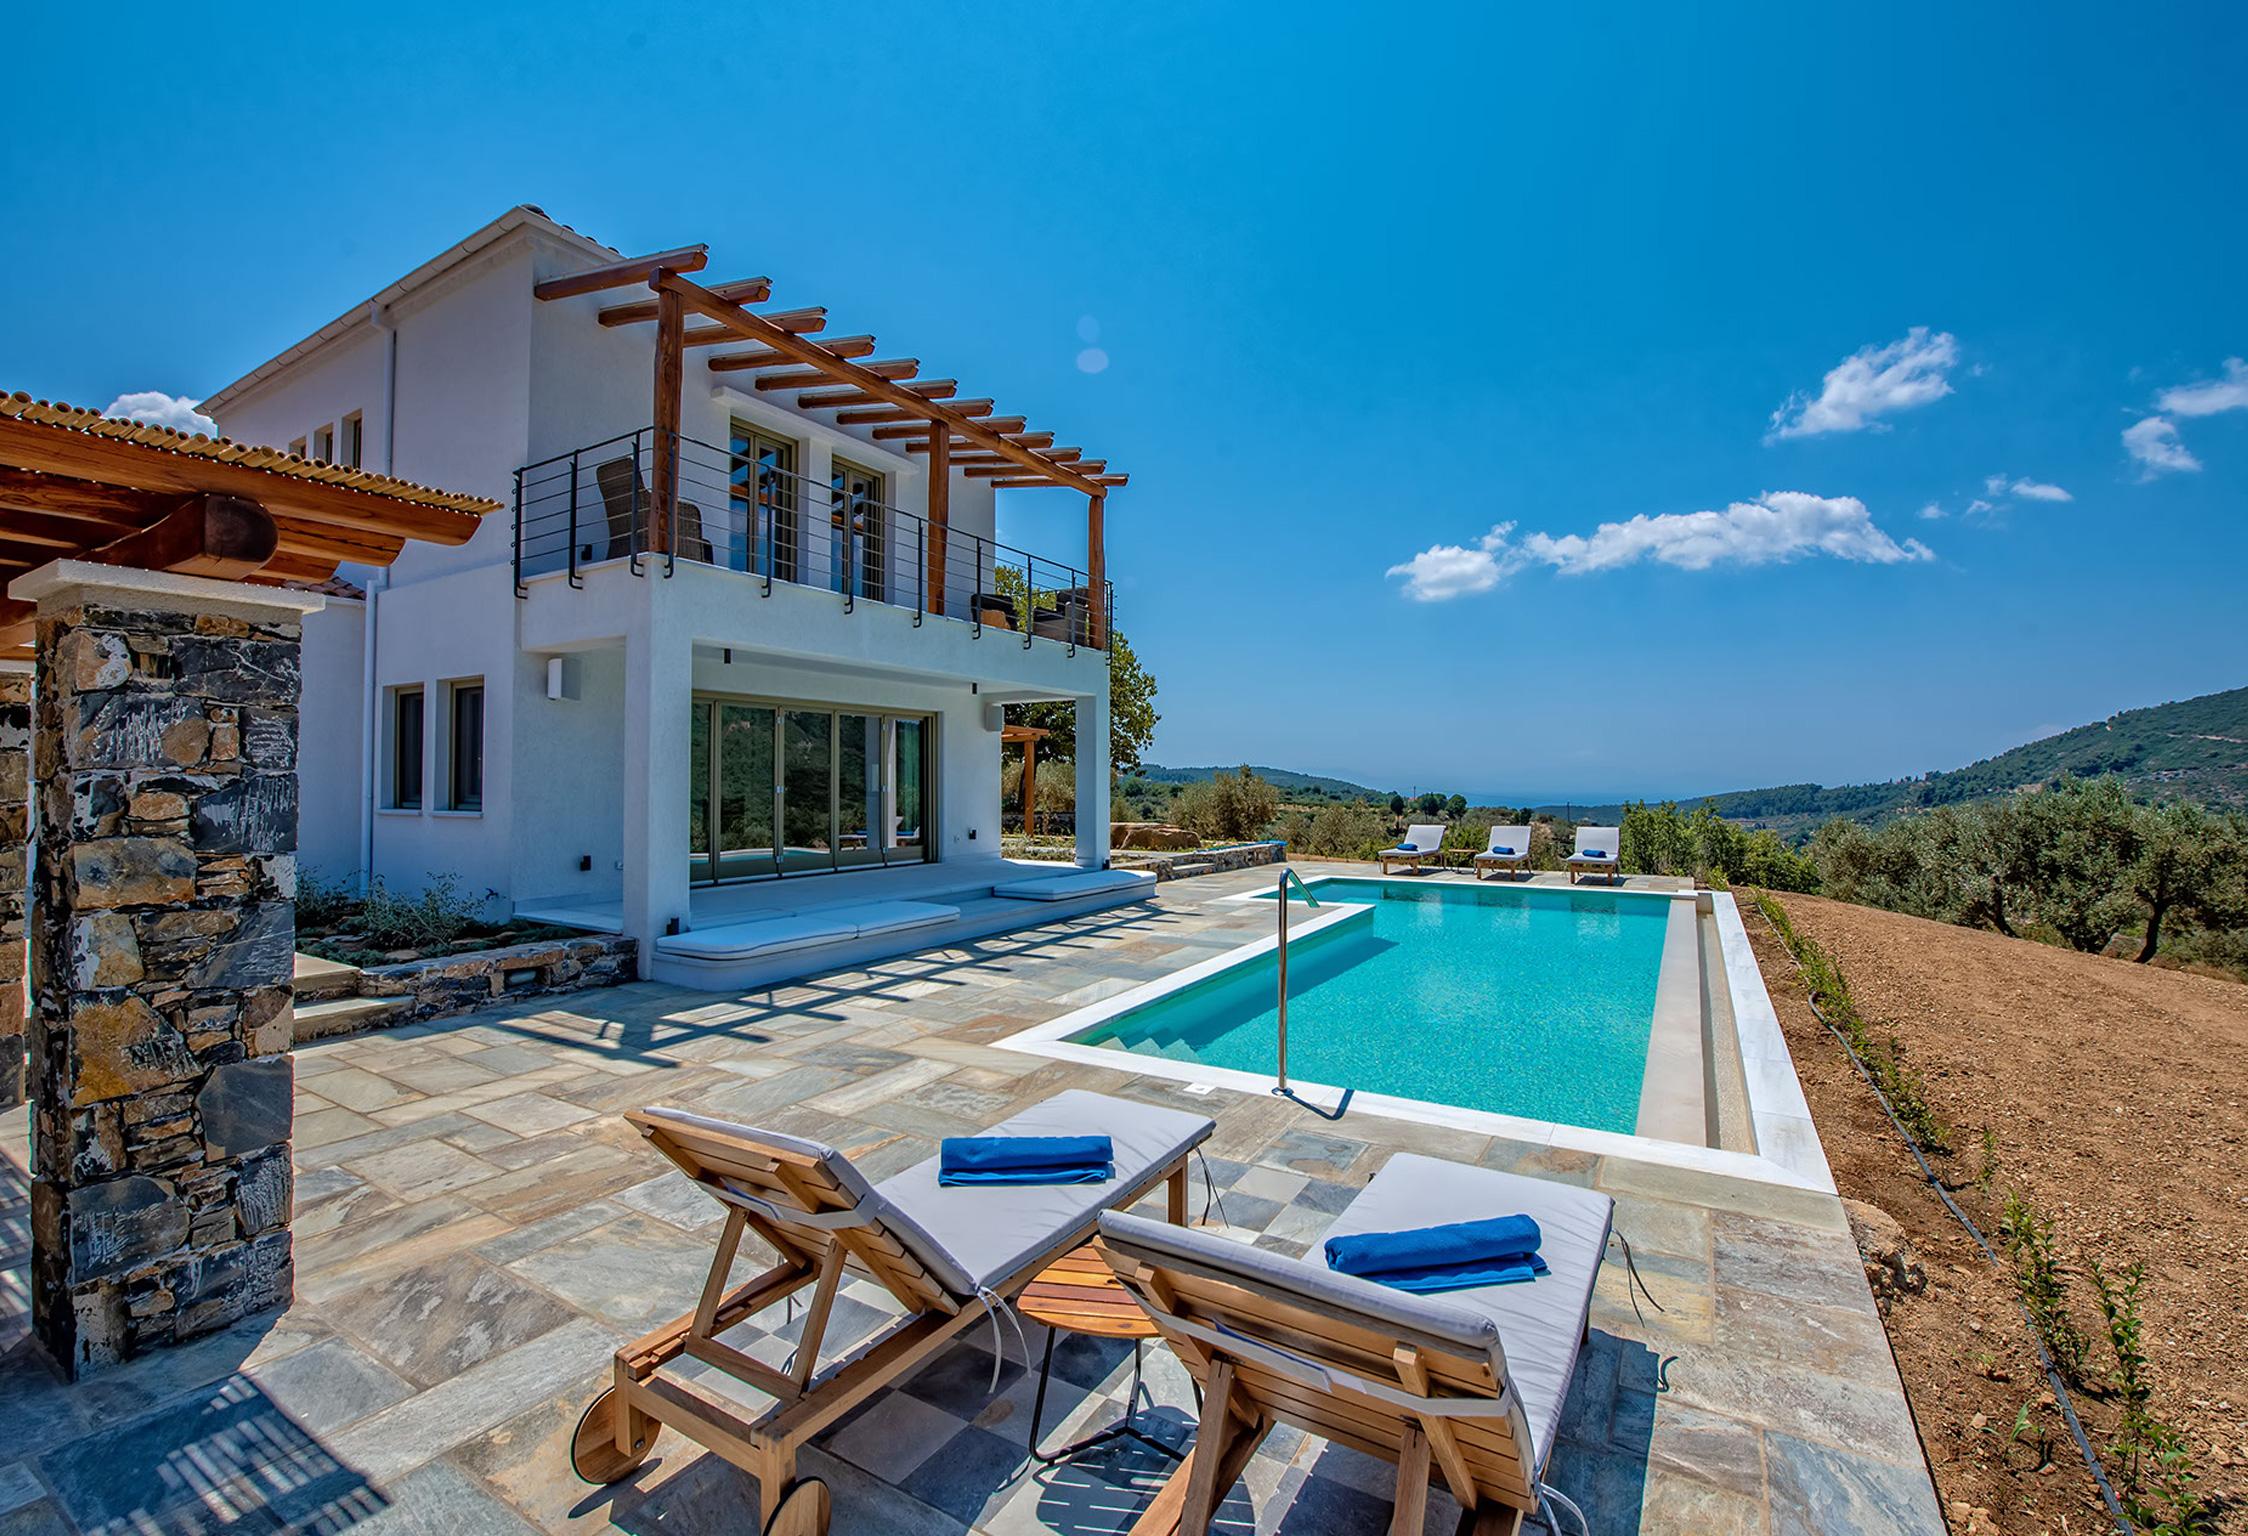 Skopelos Villa Francesca jumbotron image